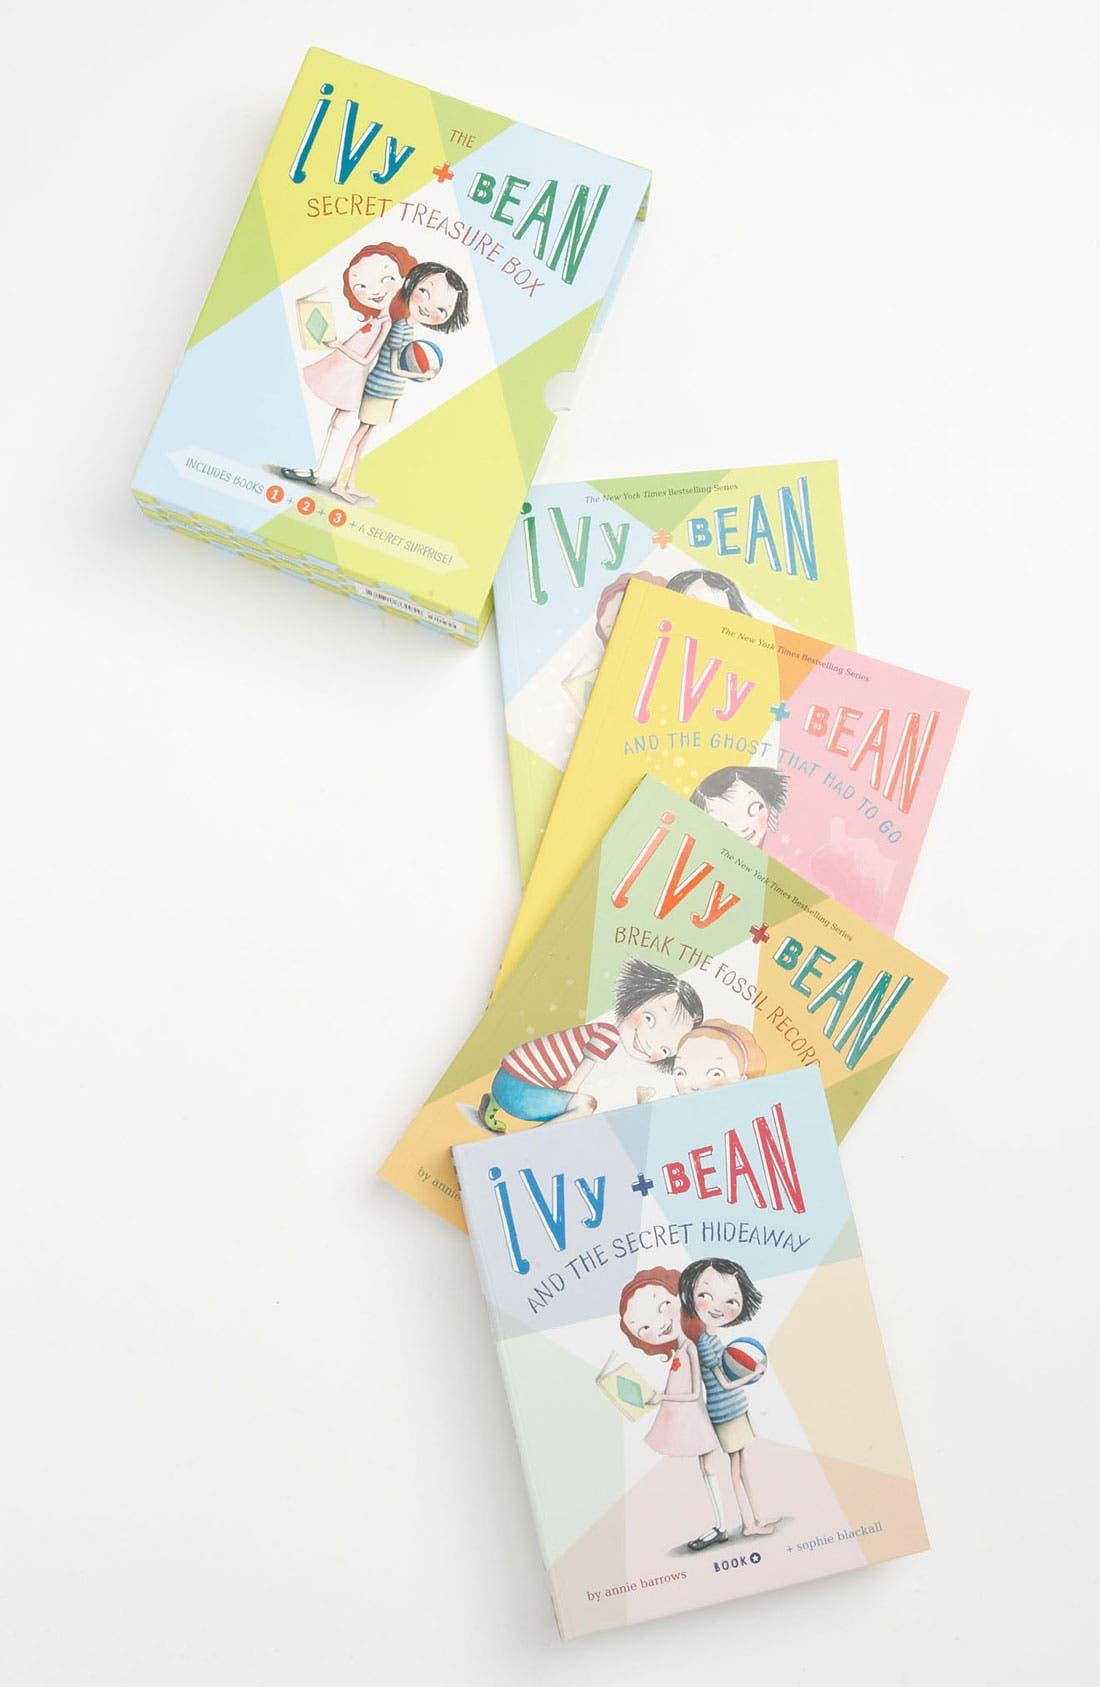 Alternate Image 1 Selected - Annie Barrows & Sophie Blackall 'Ivy + Bean' Secret Treasure Box Set